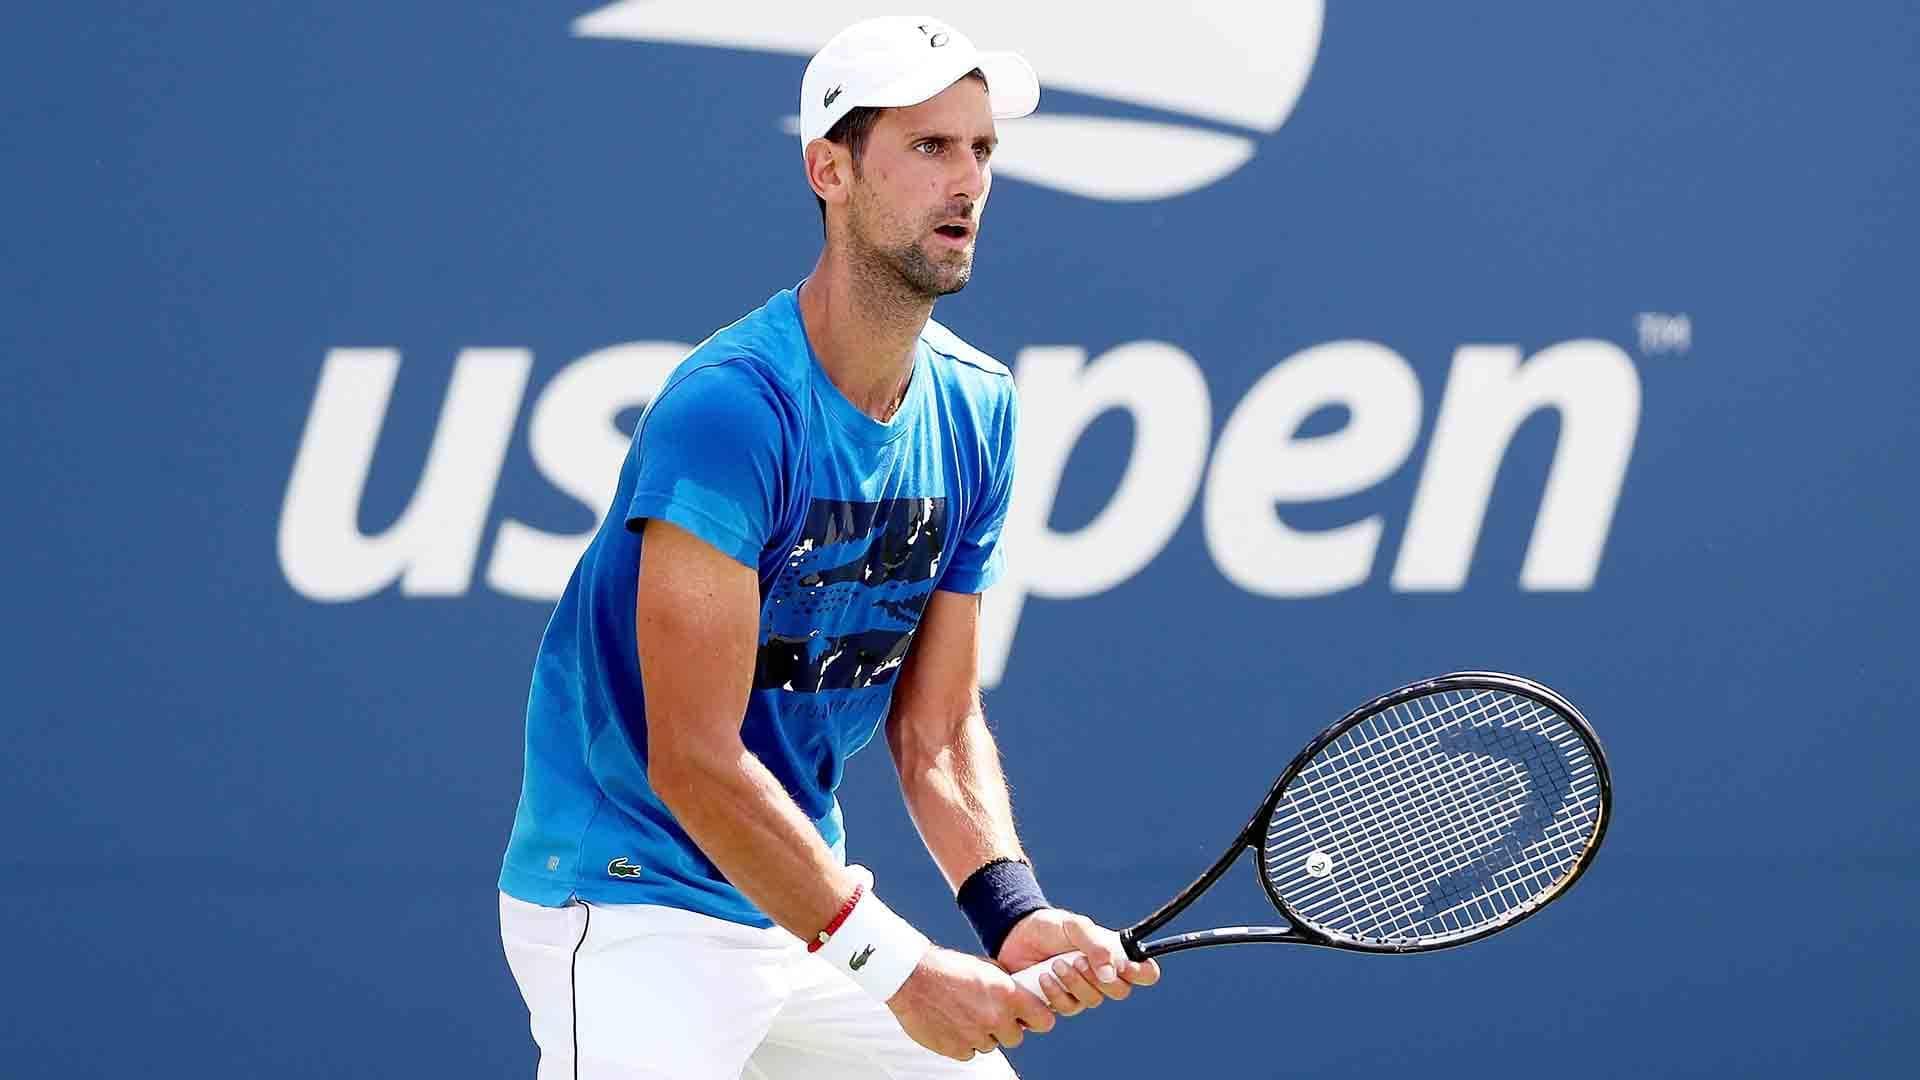 Novak Djokovic Roger Federer Headline Day 1 At Us Open Atp Tour Tennis